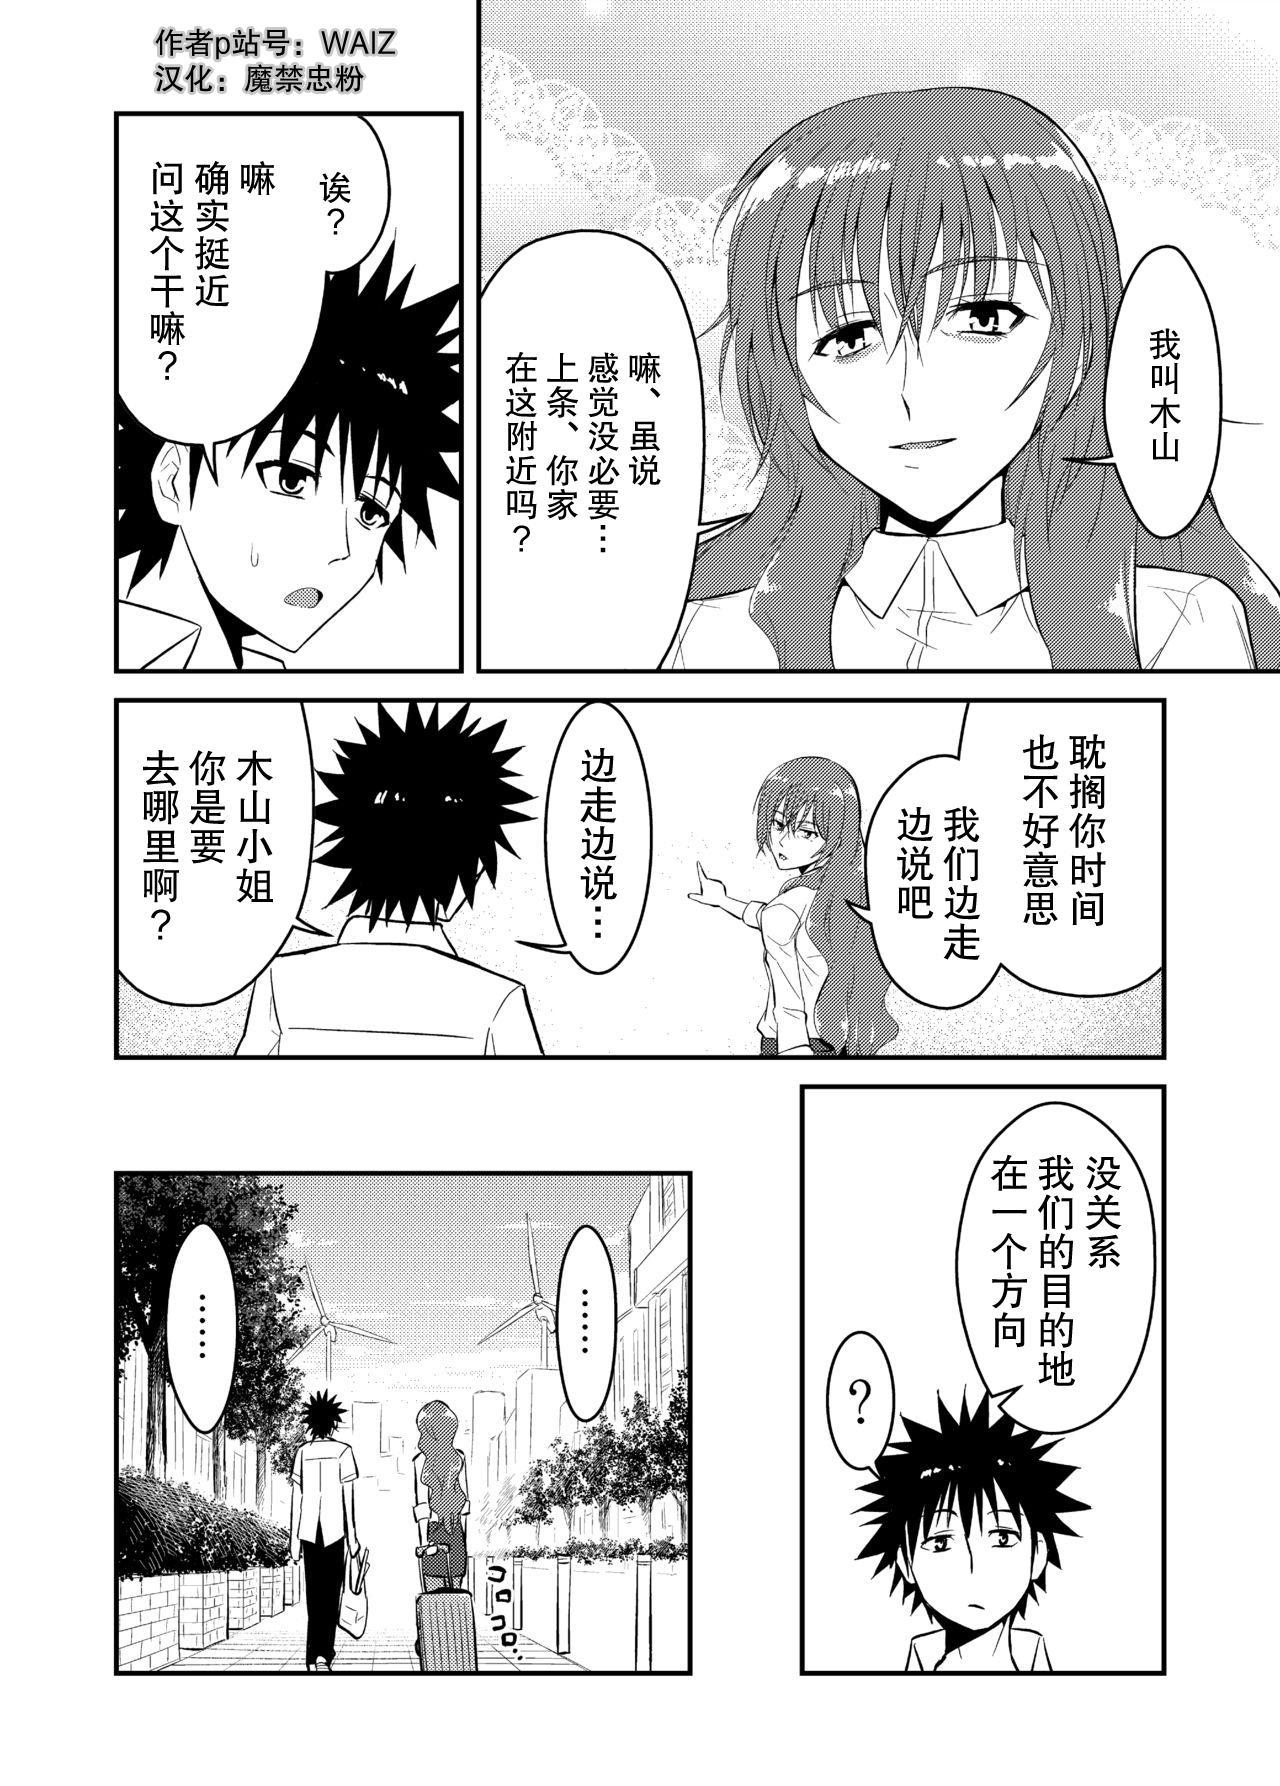 [WAIZ][同人个人渣汉化][就算是上条先生我家要住7个人还是太勉强了](Toaru Majutsu no Index) [中国翻译] 18